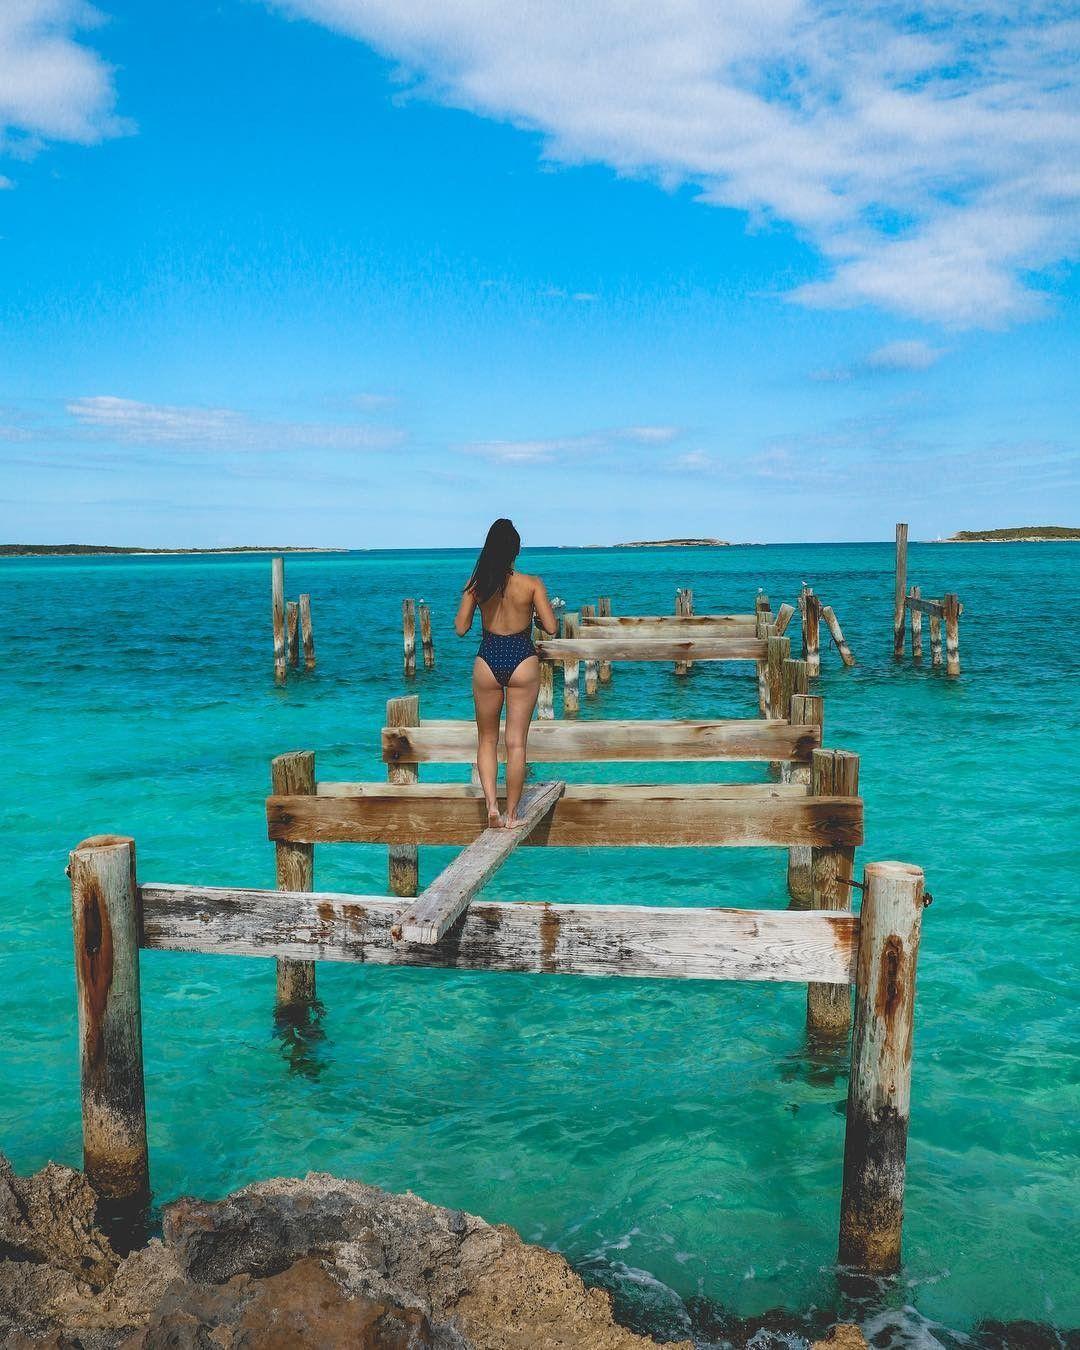 dayyachtcharter posted to Instagram: Exuma The Bahamas